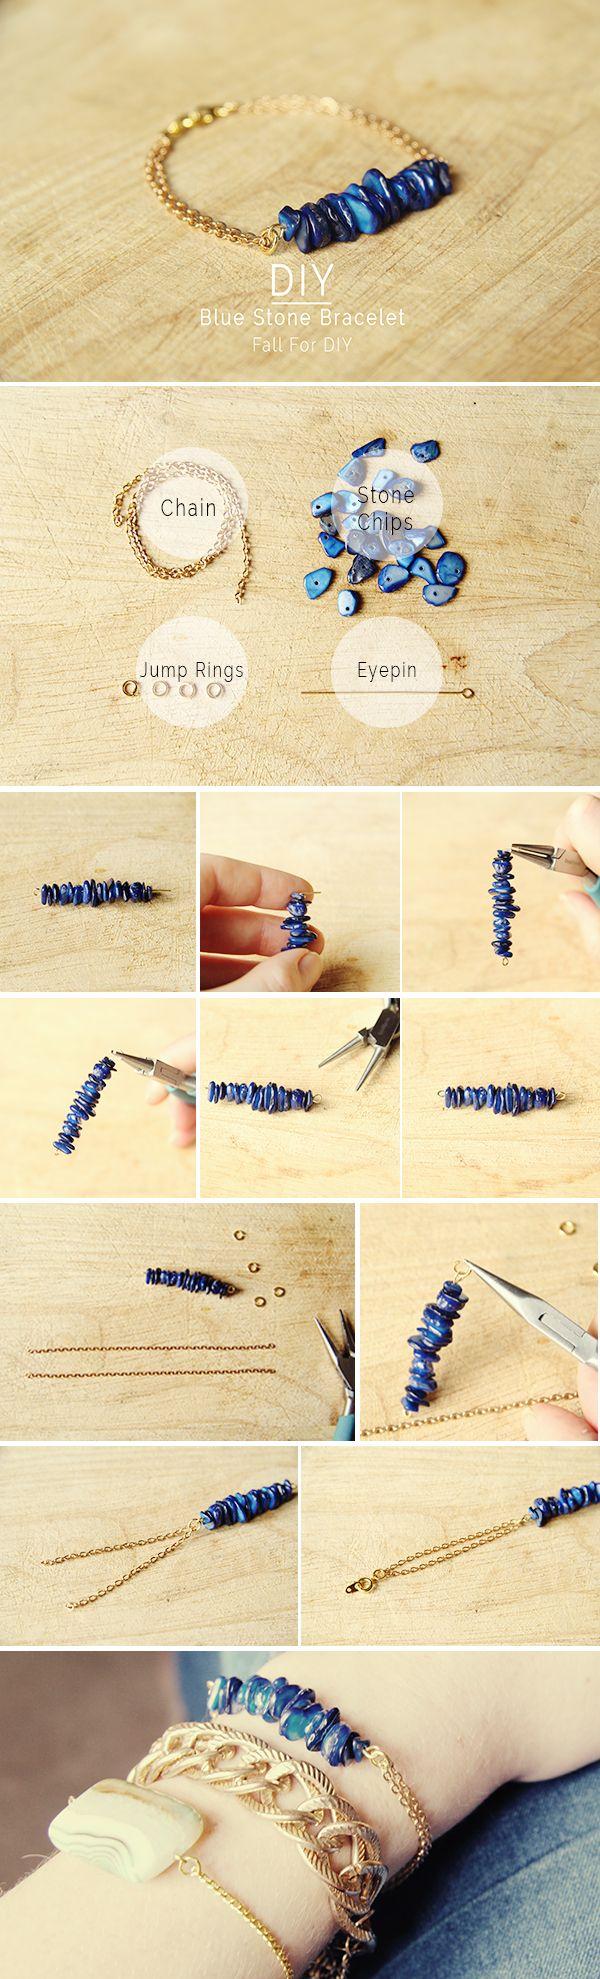 diy jewelry 23